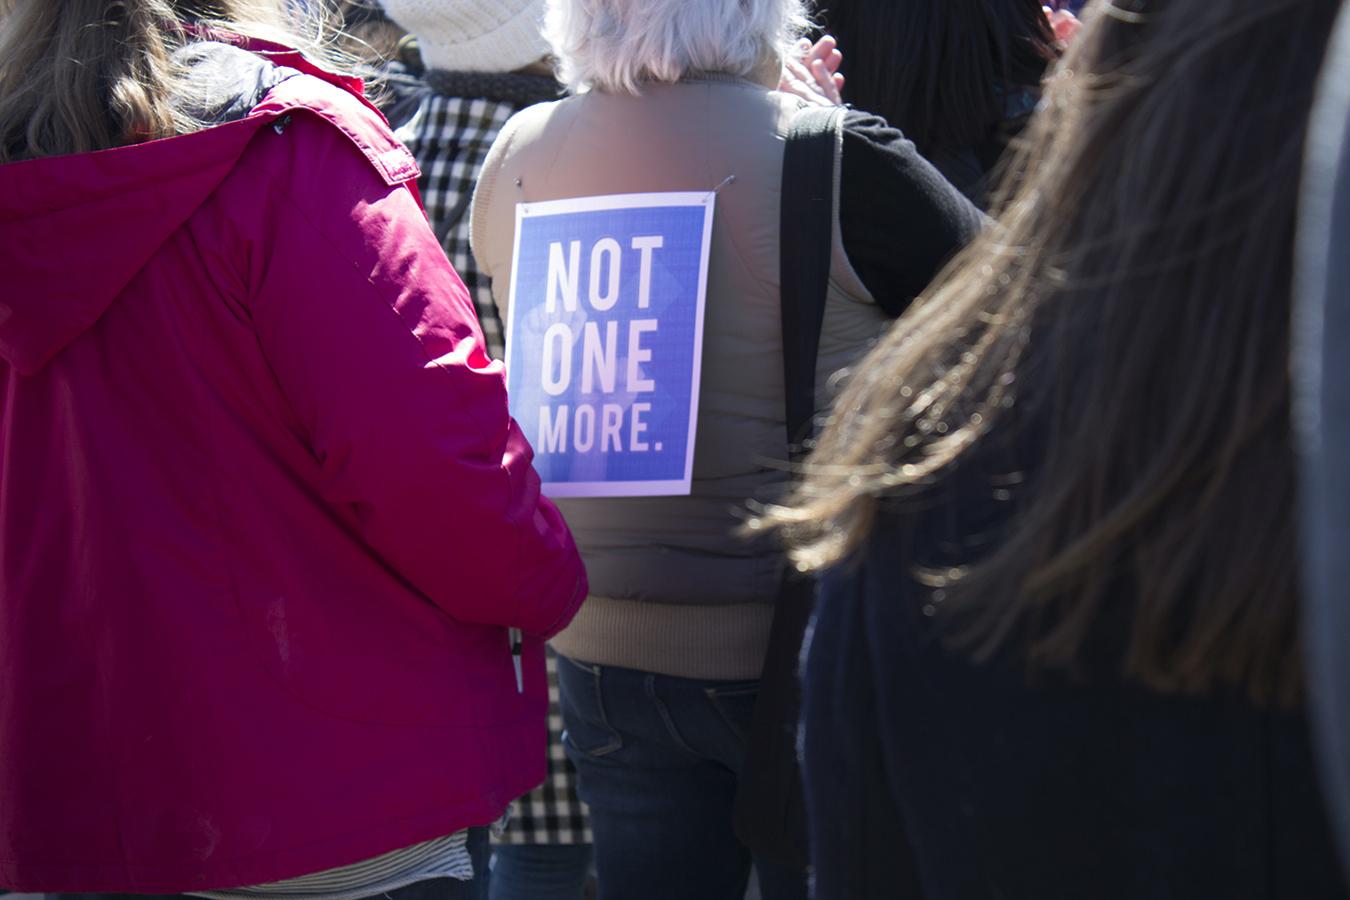 Hilary_Lam_Hugs_not_guns_protestor_philadelphia_anti_gun